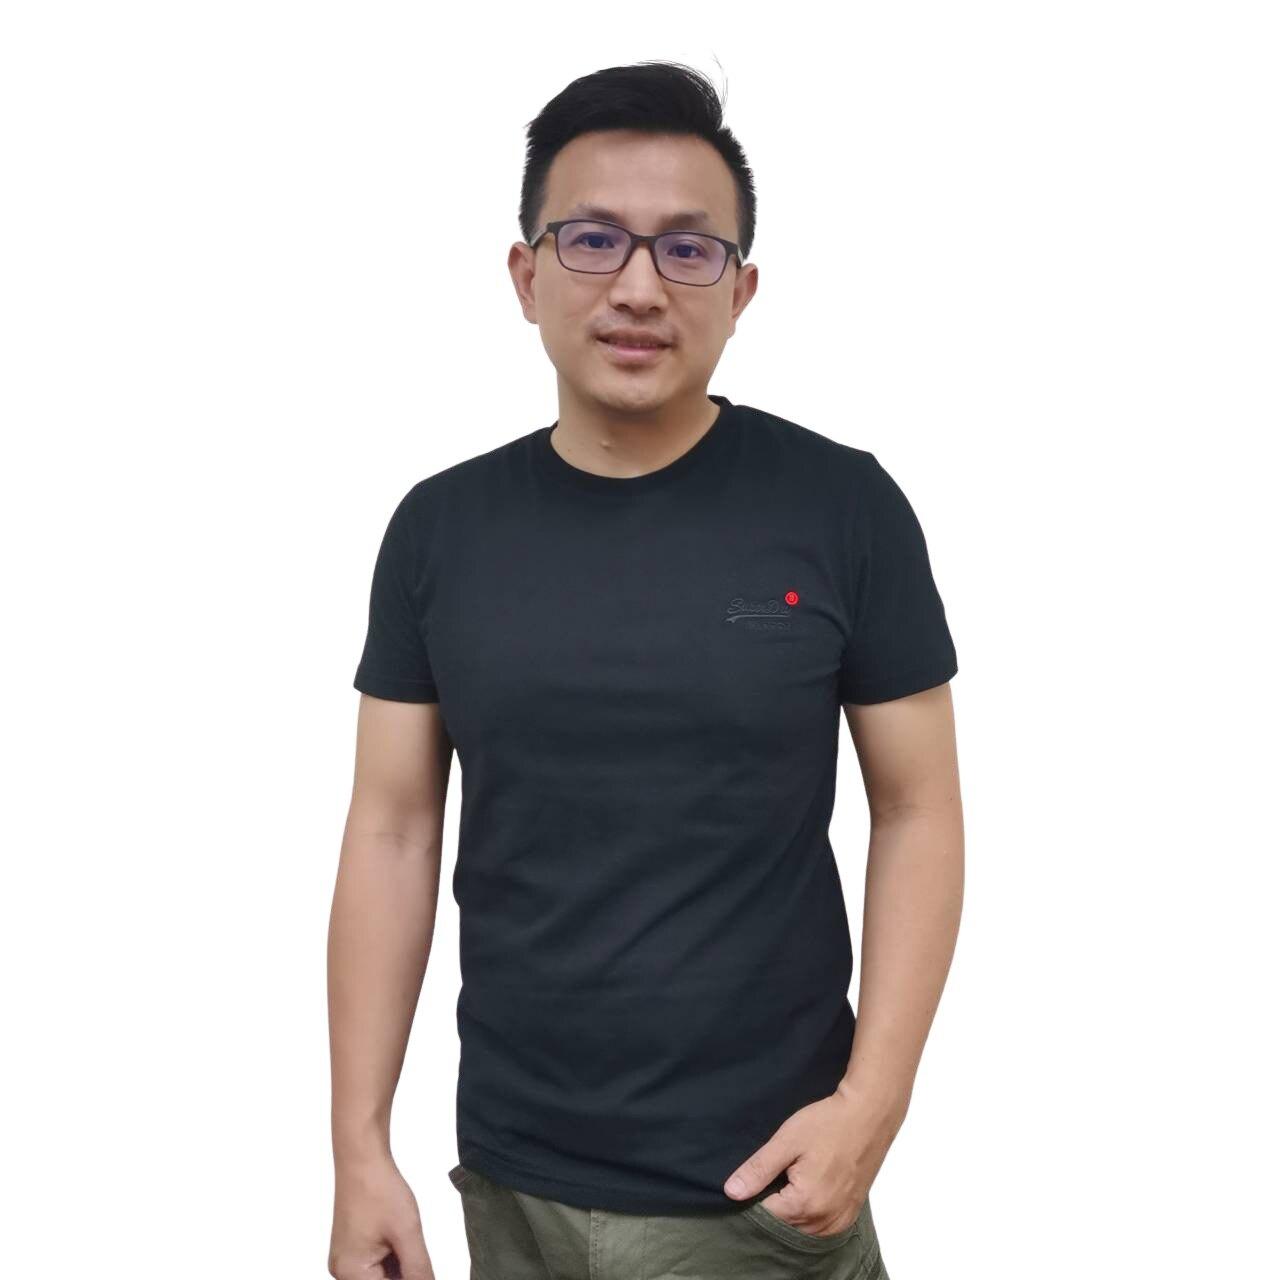 Superdry 冒險魂 極度乾燥 新款男版 圓領 短袖T恤 熱銷黑色素T  100%有機棉 材質柔軟 可搭情侶裝